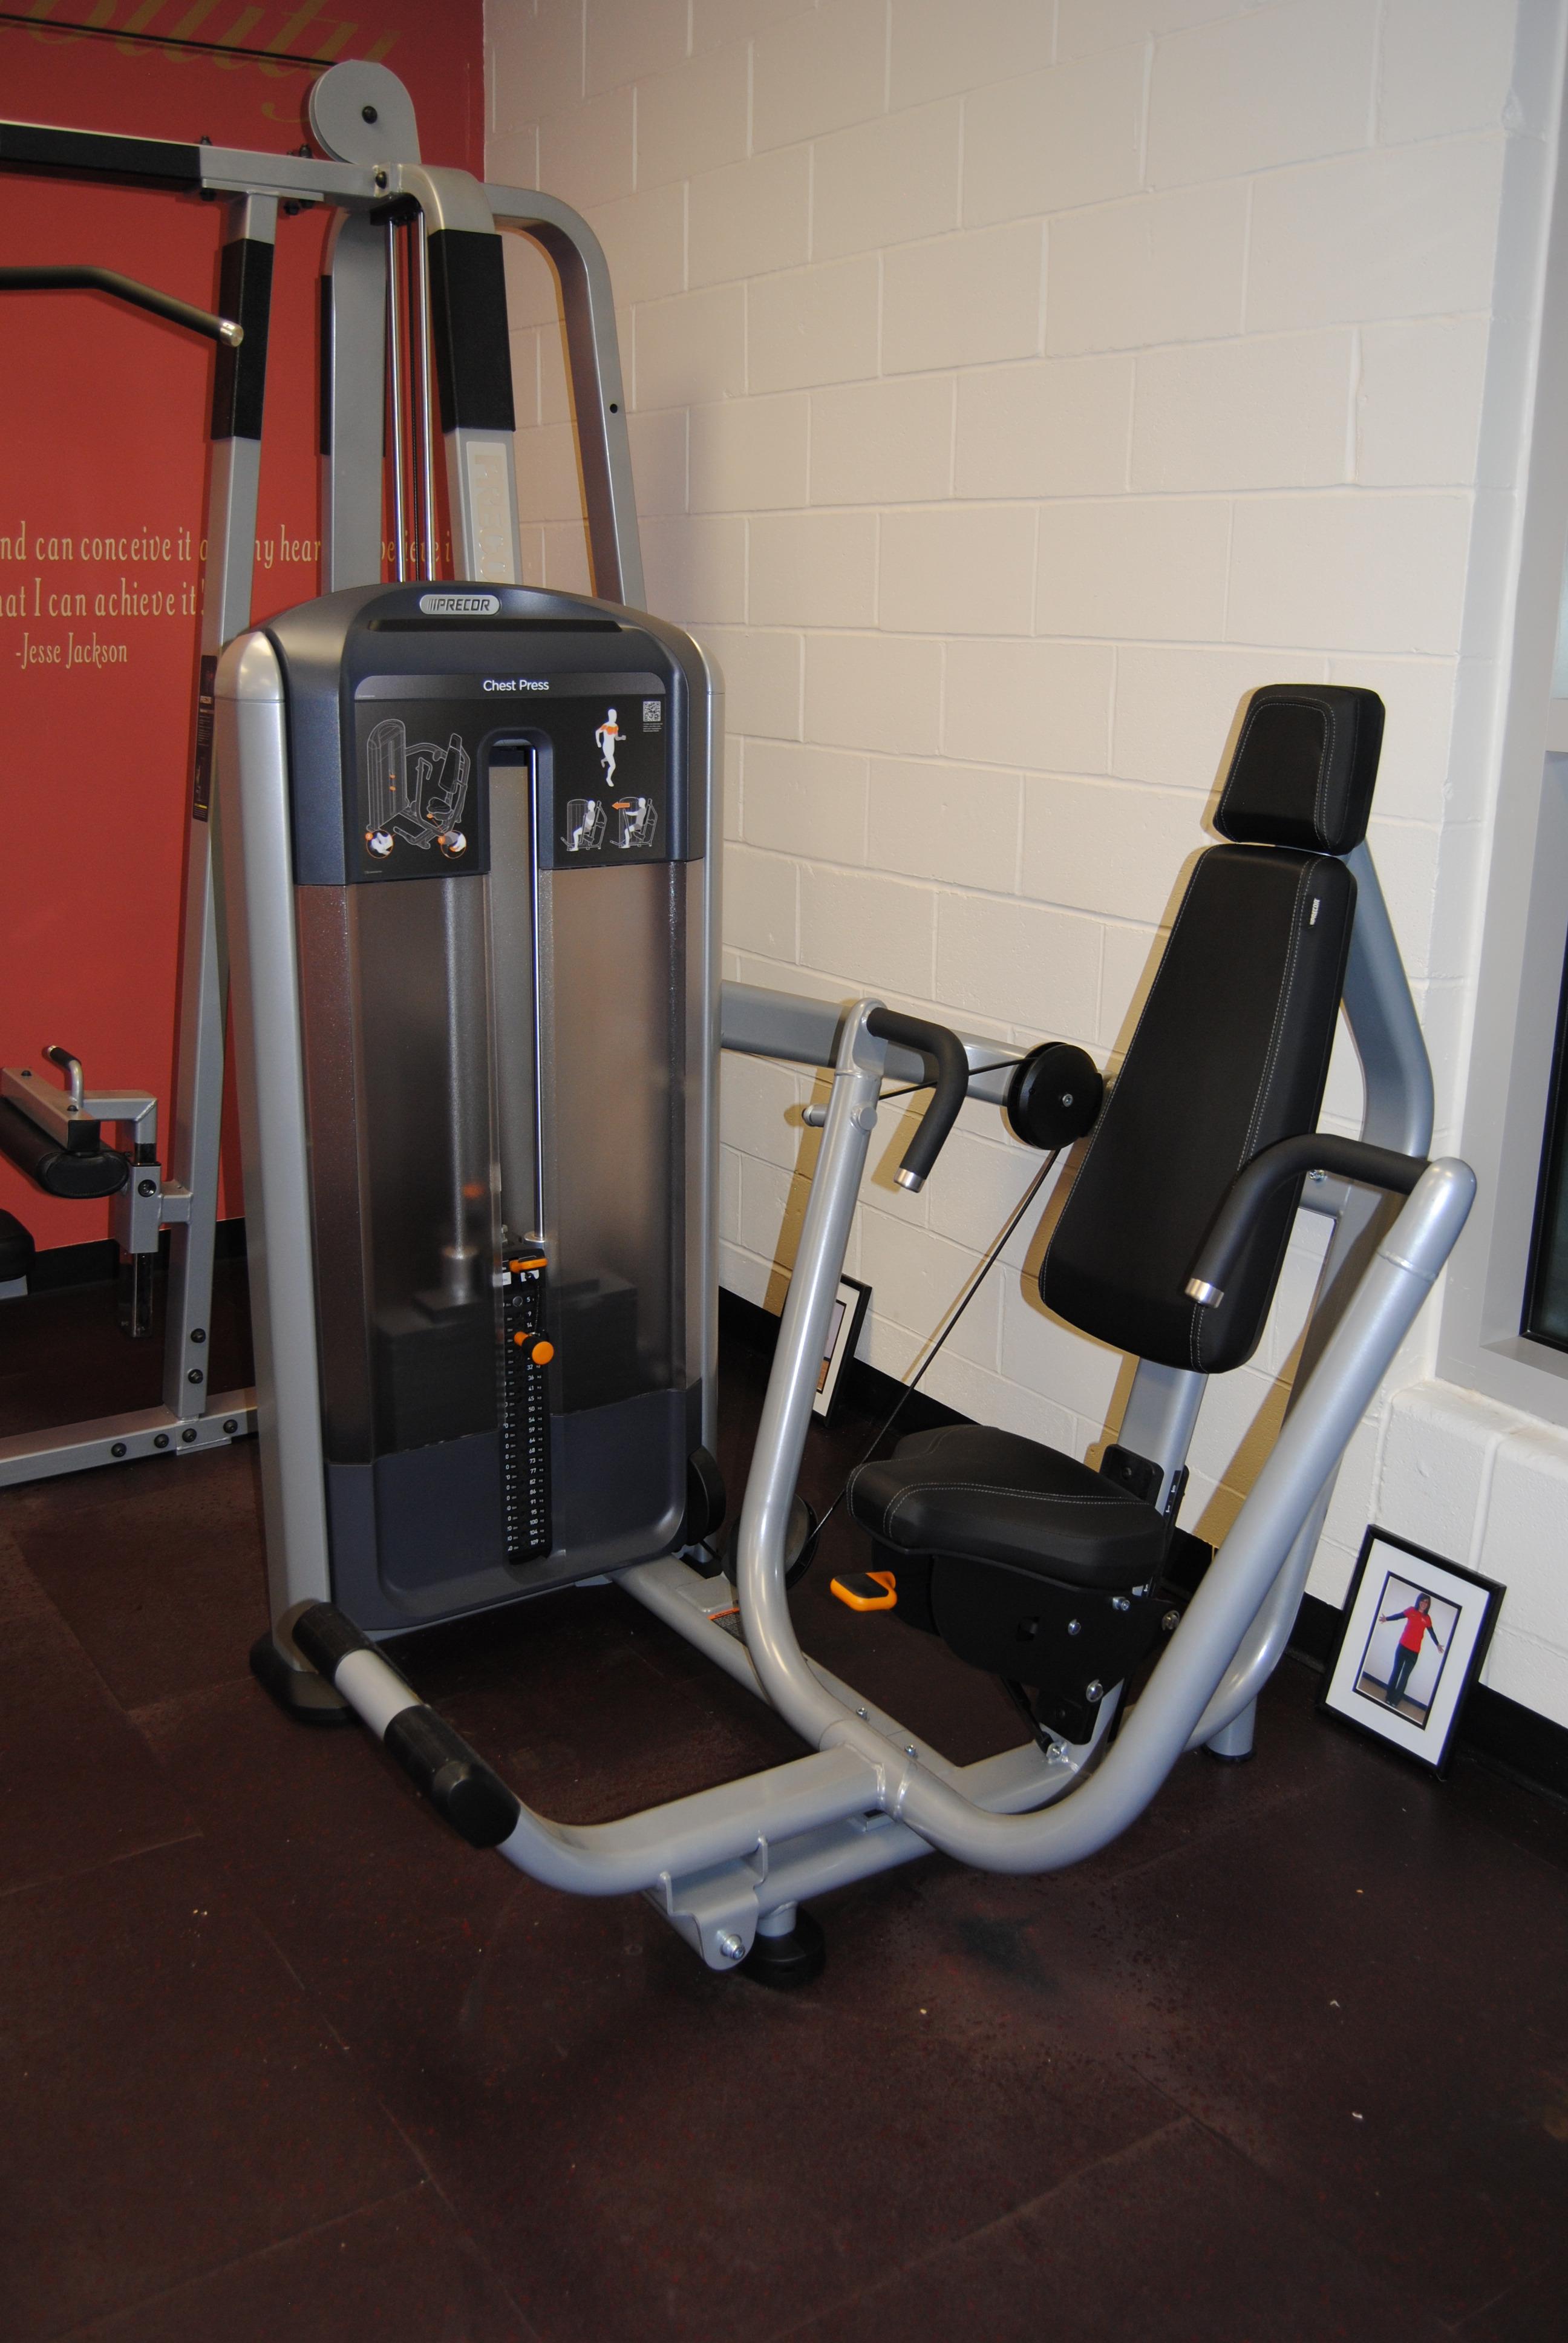 a471e9837f4df4b5bcf7_Wellness_Coaching_Equipment_2014_004.jpg